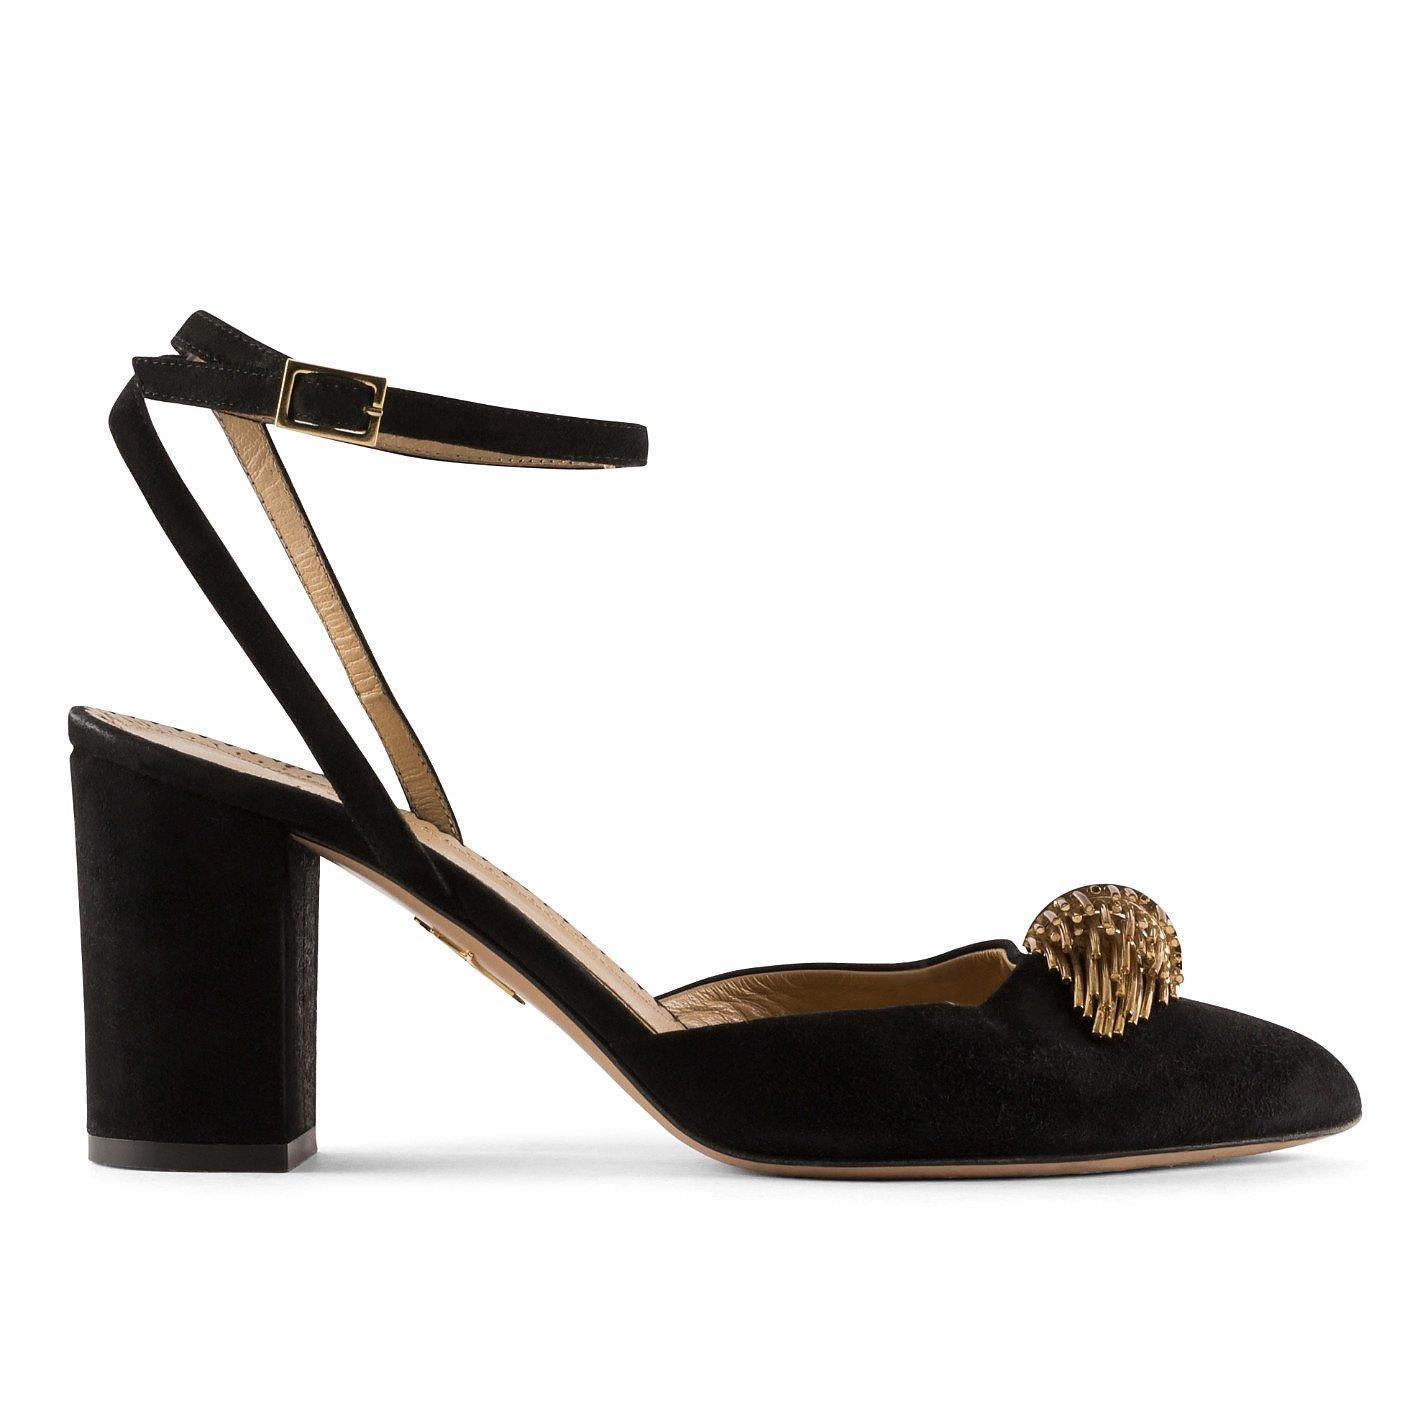 Charlotte Olympia Embellished Block-Heel Pumps